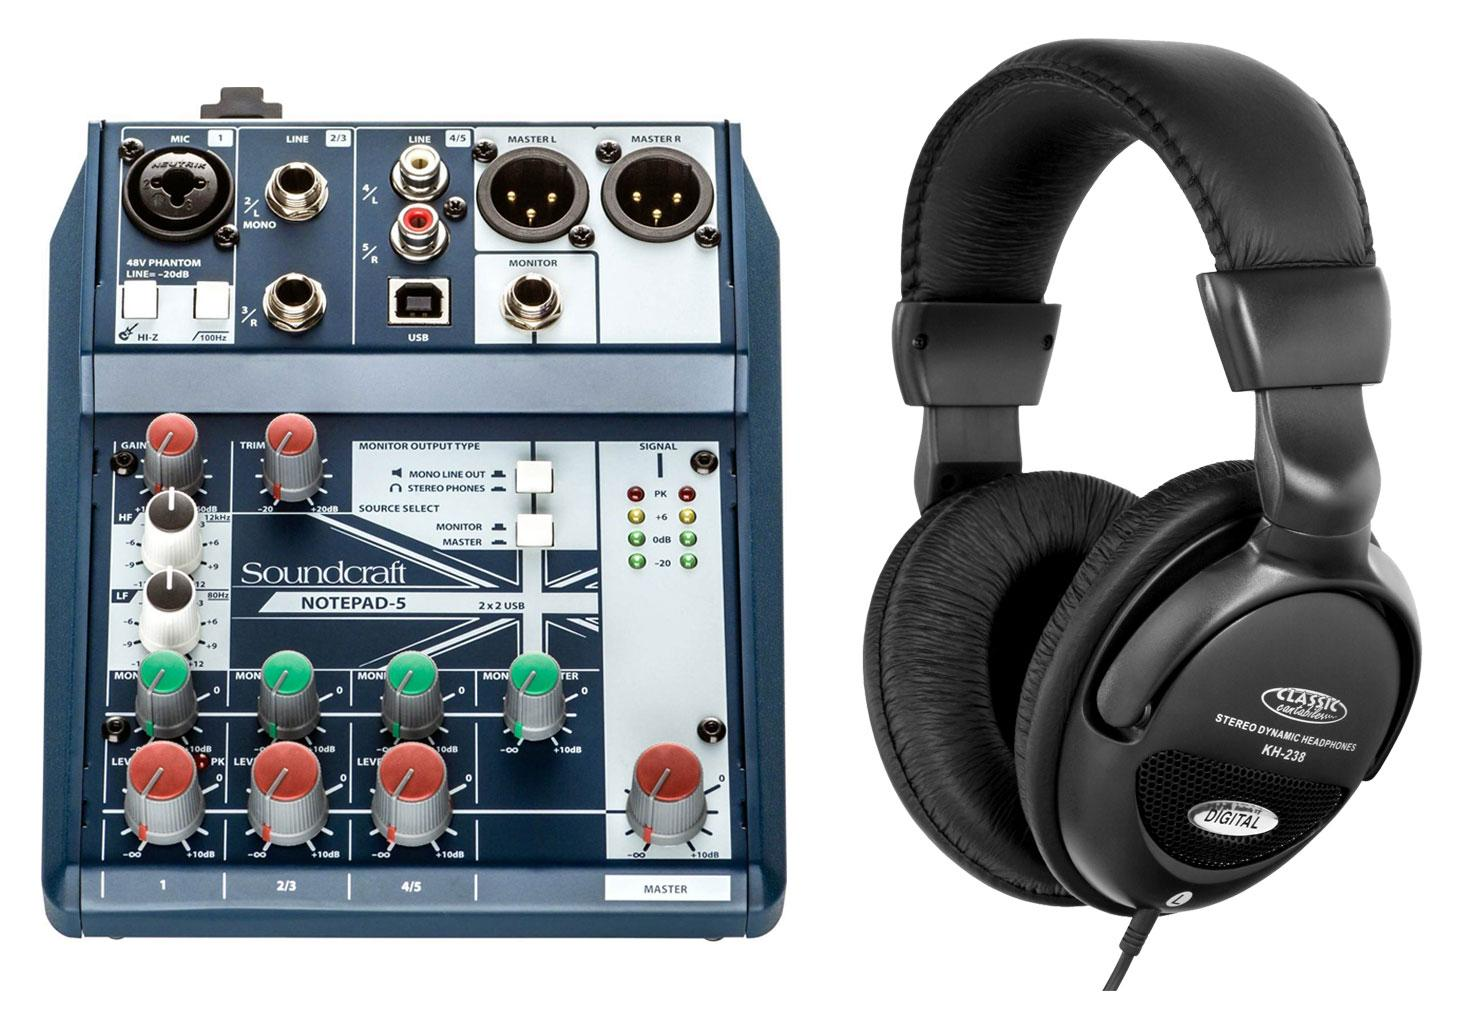 Mischpulte - Soundcraft Notepad 5 Kompaktmischpult Set inkl. Kopfhörer - Onlineshop Musikhaus Kirstein